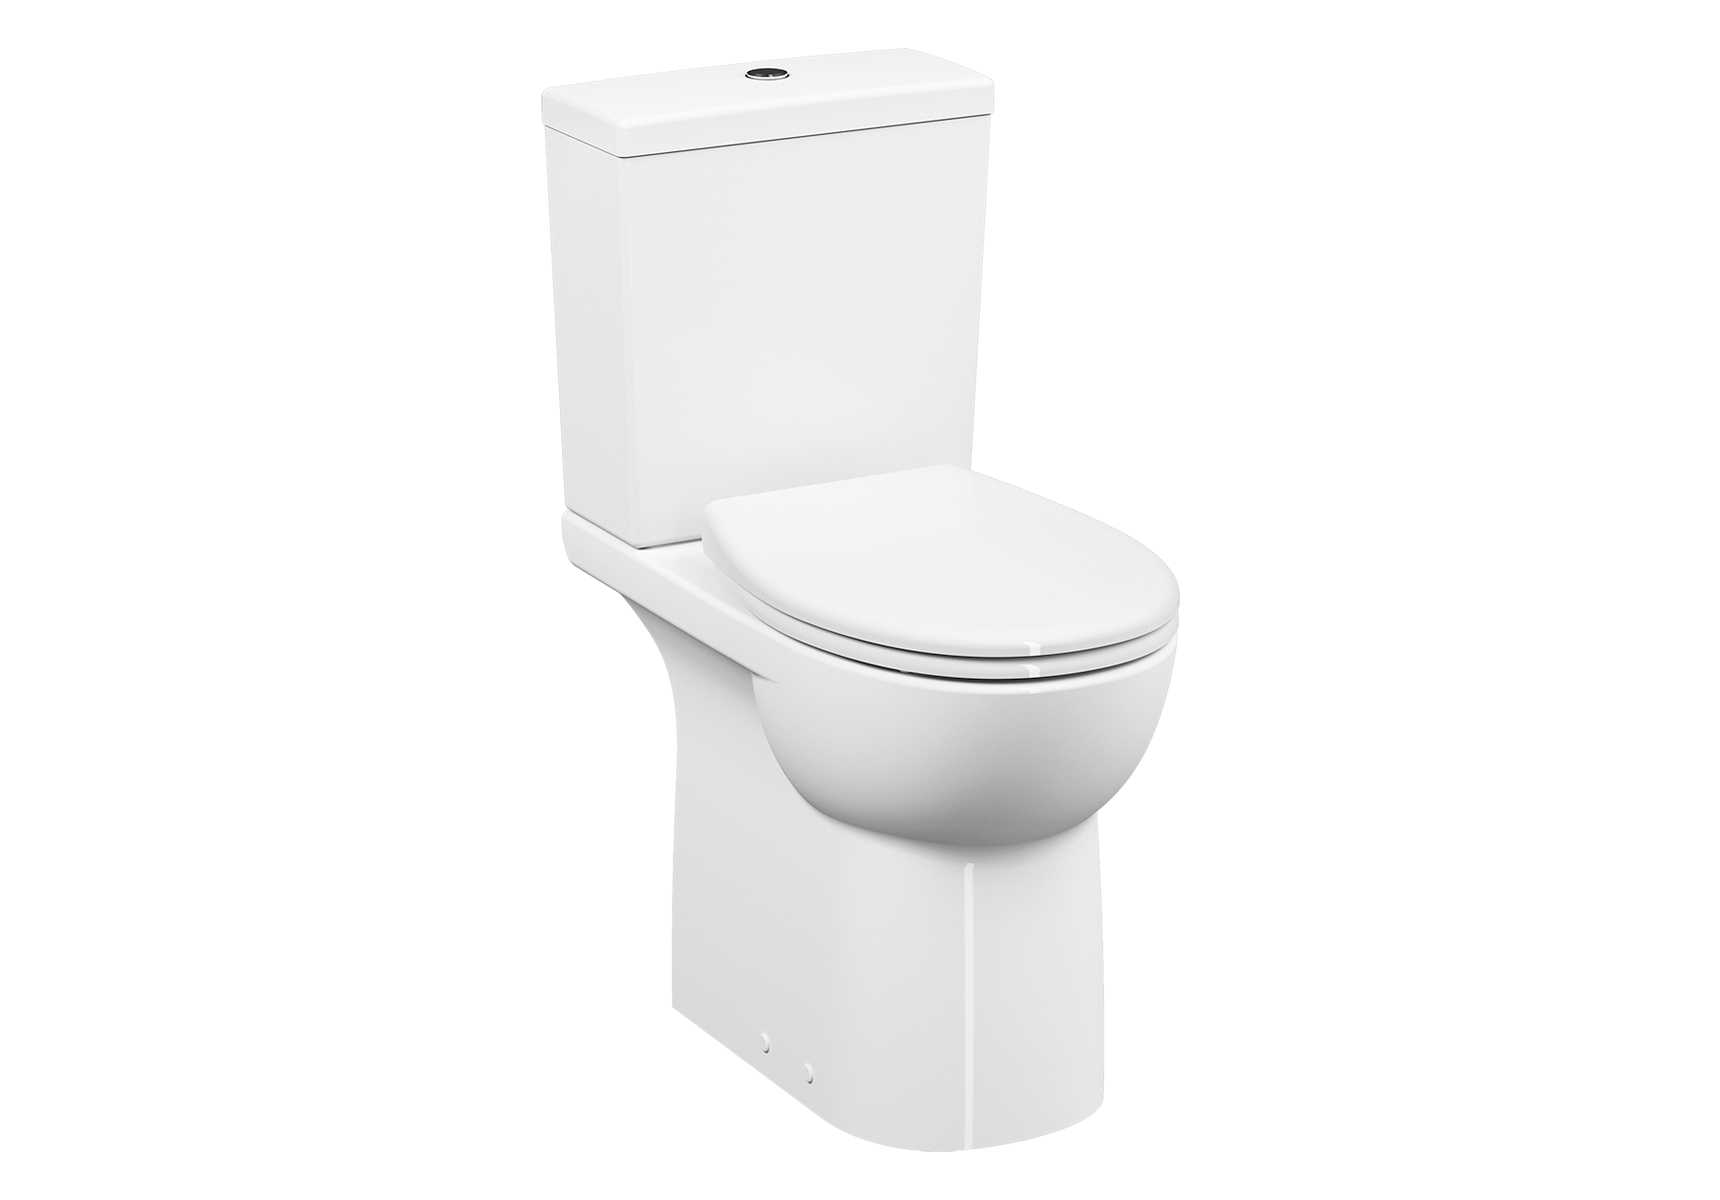 Conforma WC à poser, fonction bidet, open back, 65 cm